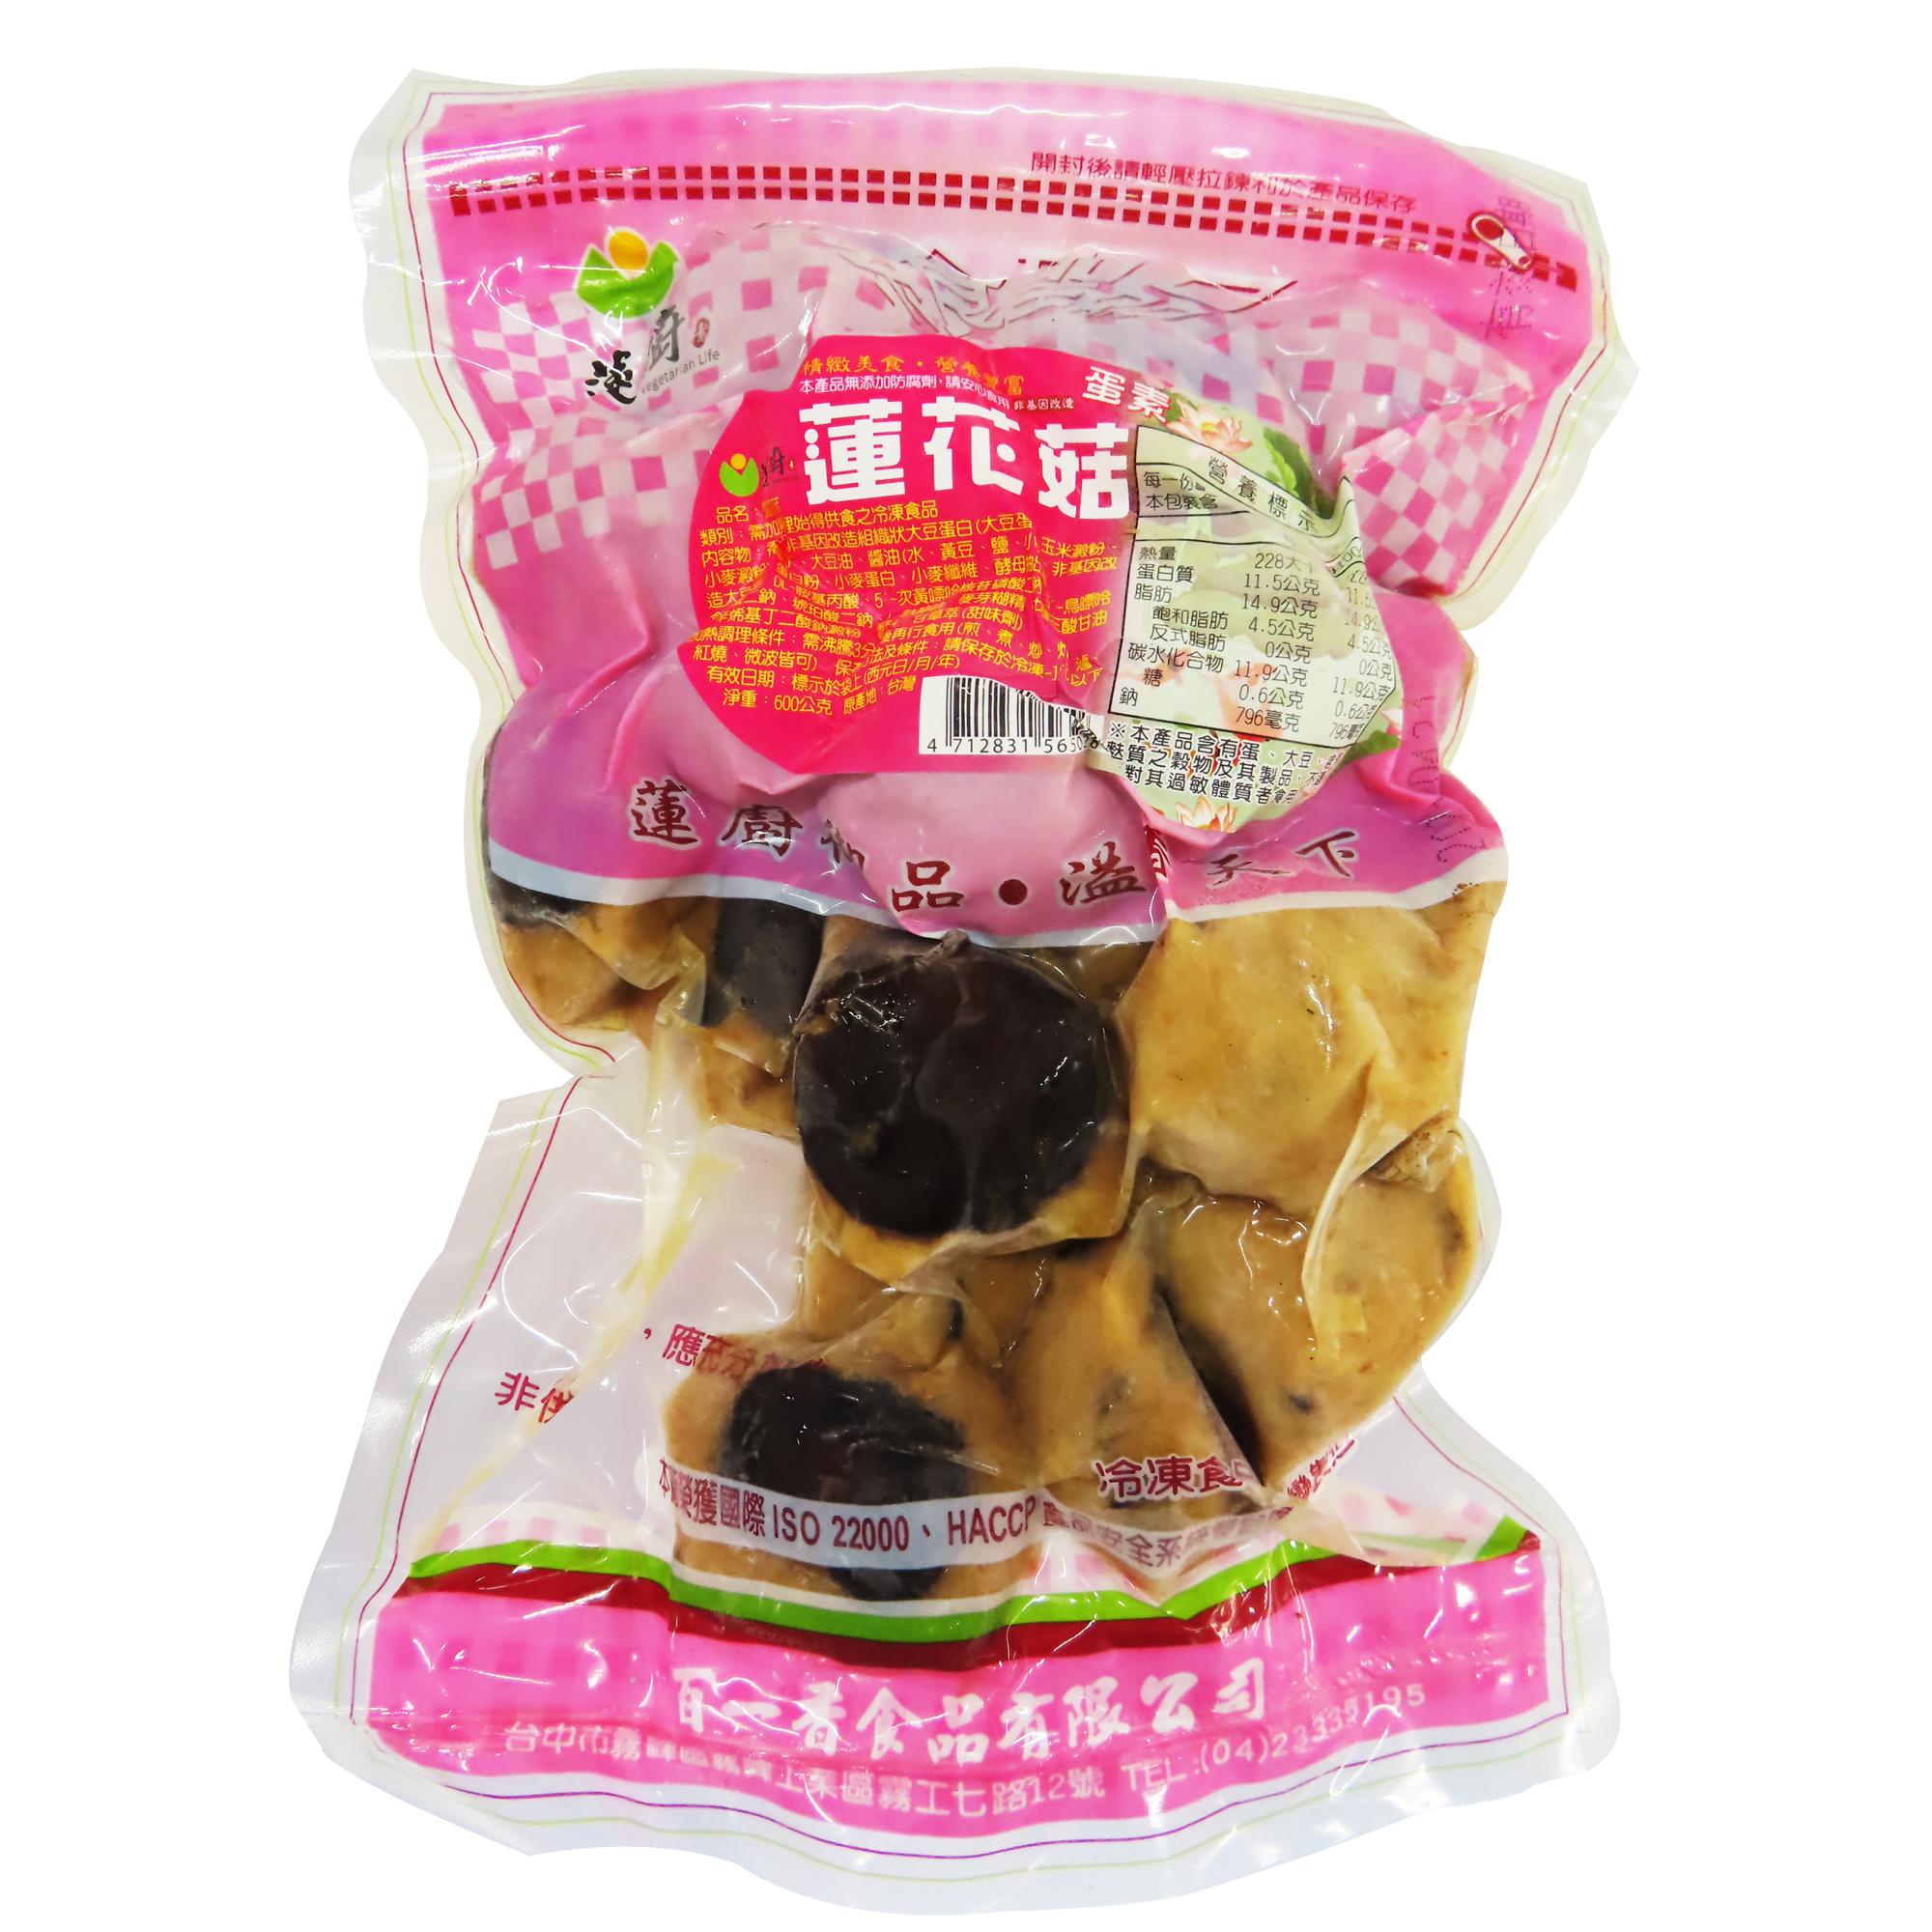 Image Lotus Mushroom Liang Hua Gu 莲厨 - 莲花菇 蓮花菇 600grams